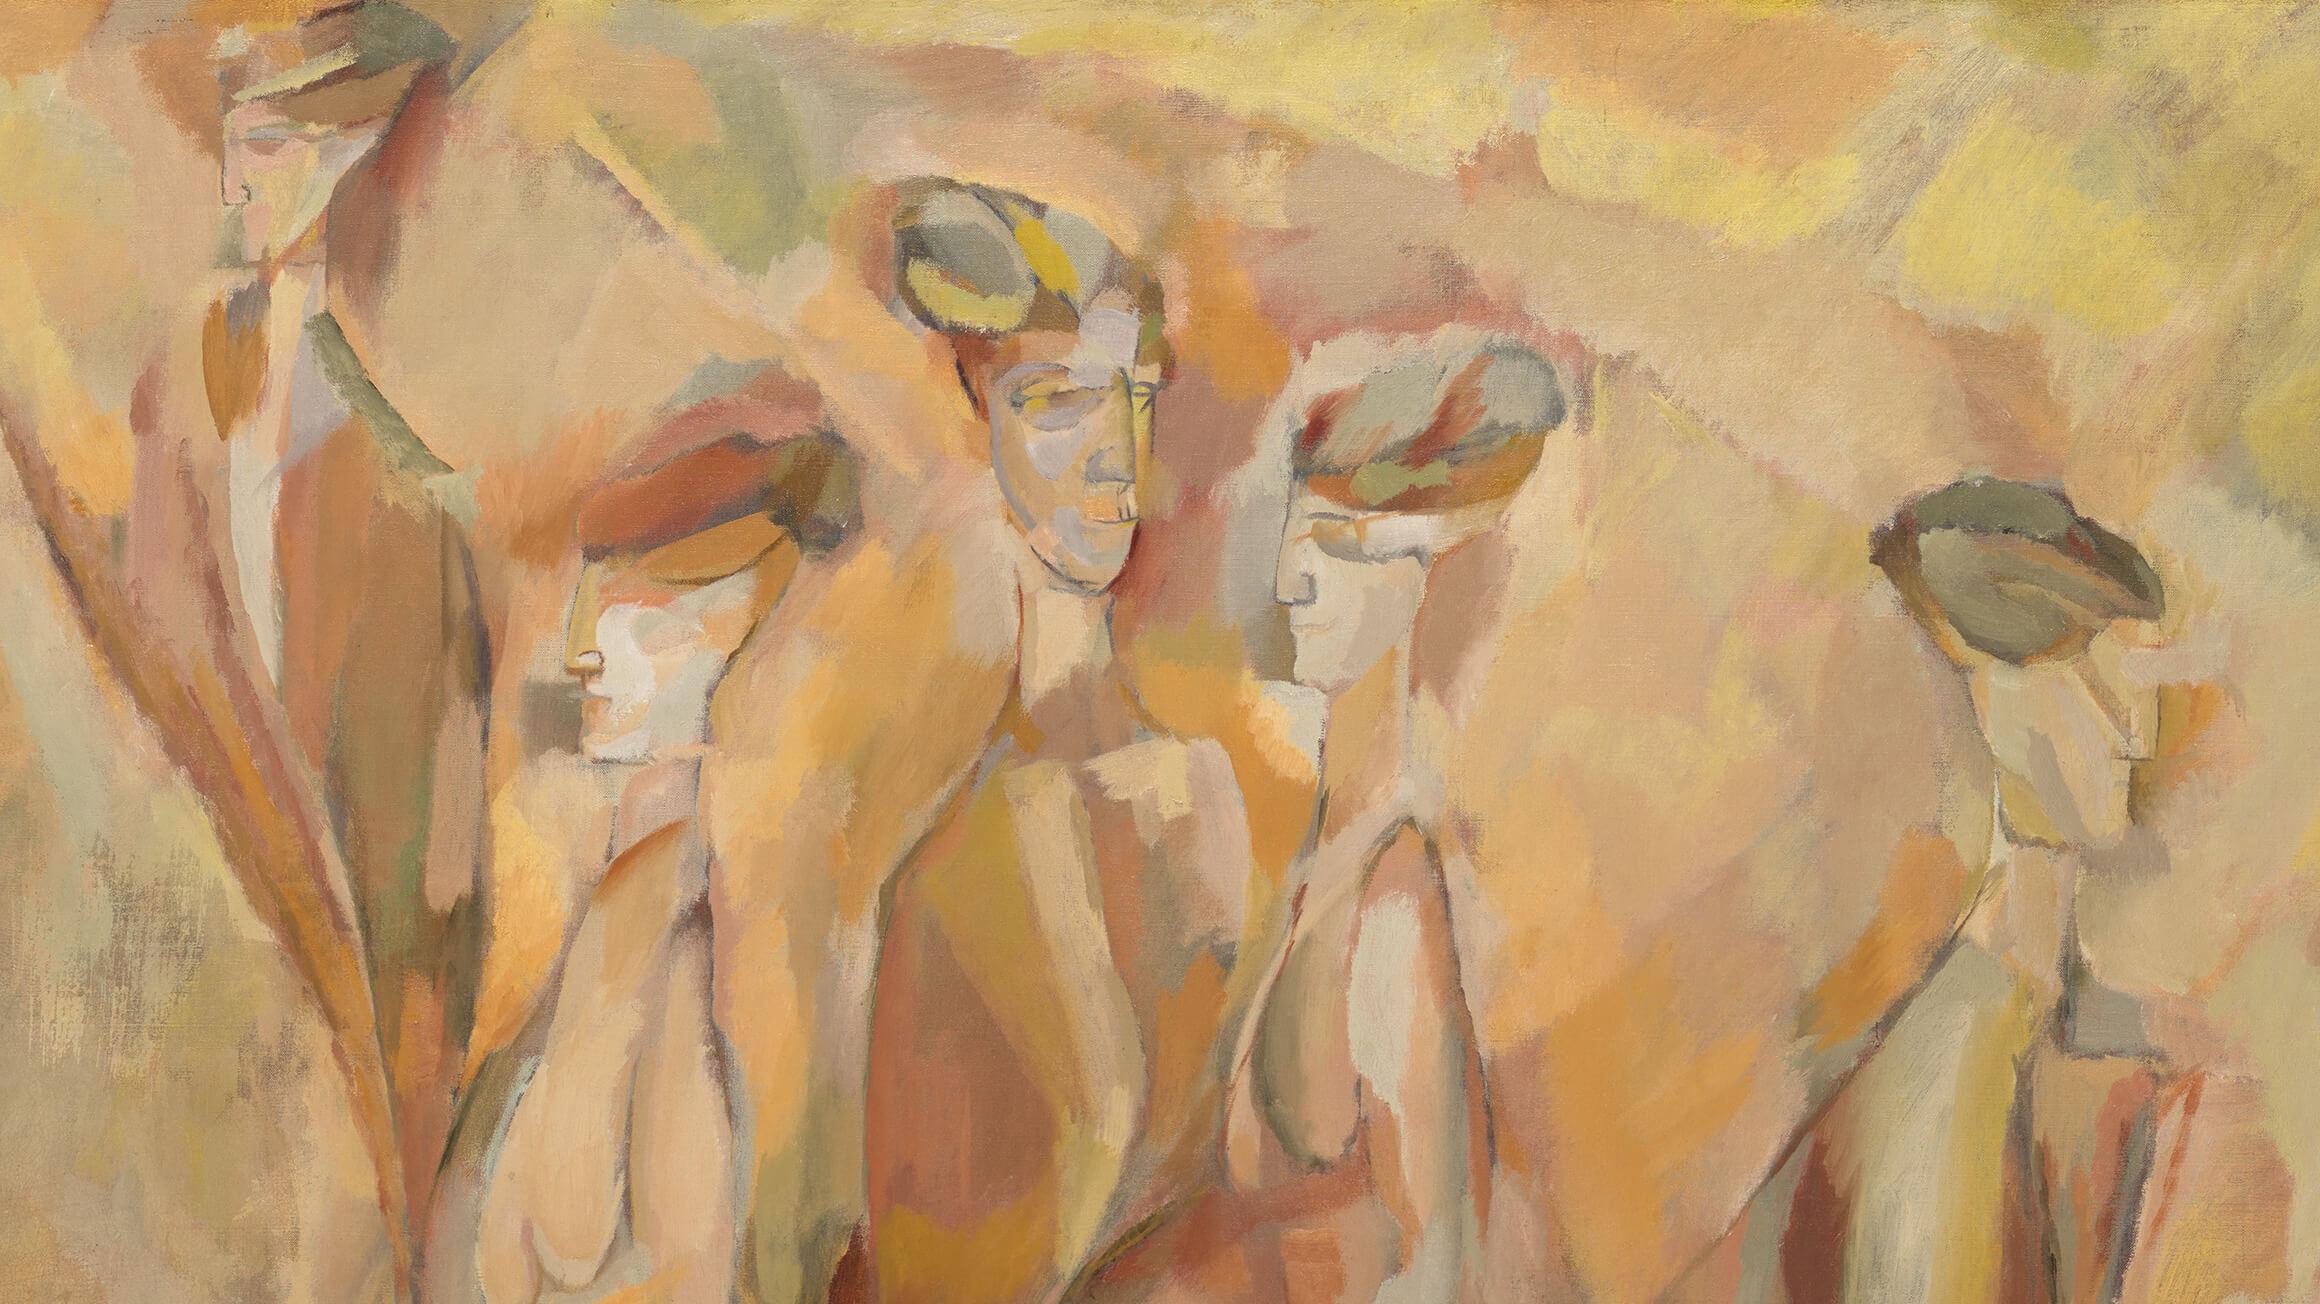 Portrait (Dulcinea) (detail), 1911, by Marcel Duchamp (American, born France, 1887–1968), 1950-134-54. © Artists Rights Society (ARS), New York / ADAGP, Paris / Succession Marcel Duchamp